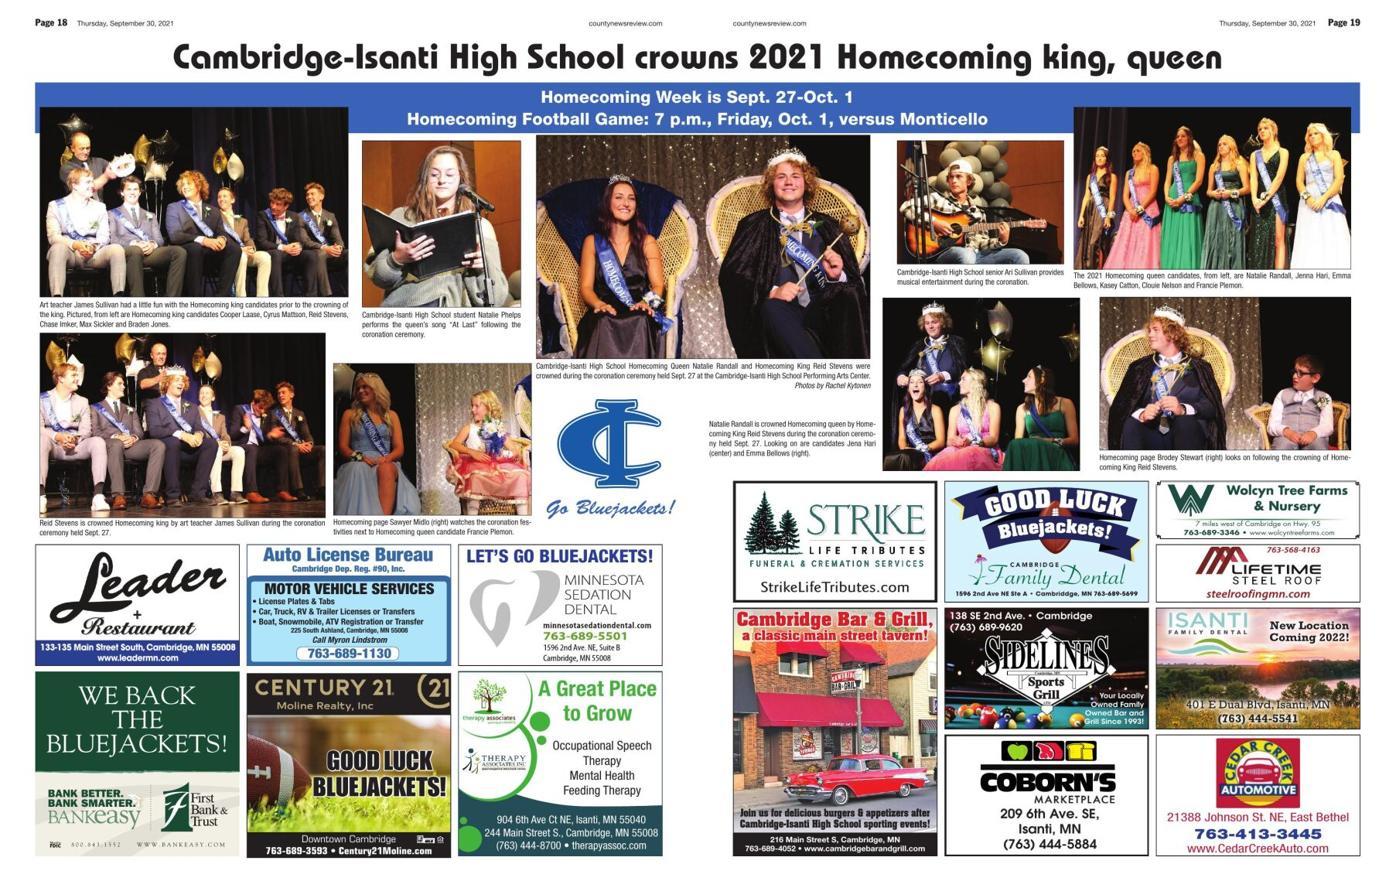 Cambridge-Isanti 2021 Homecoming Coronation